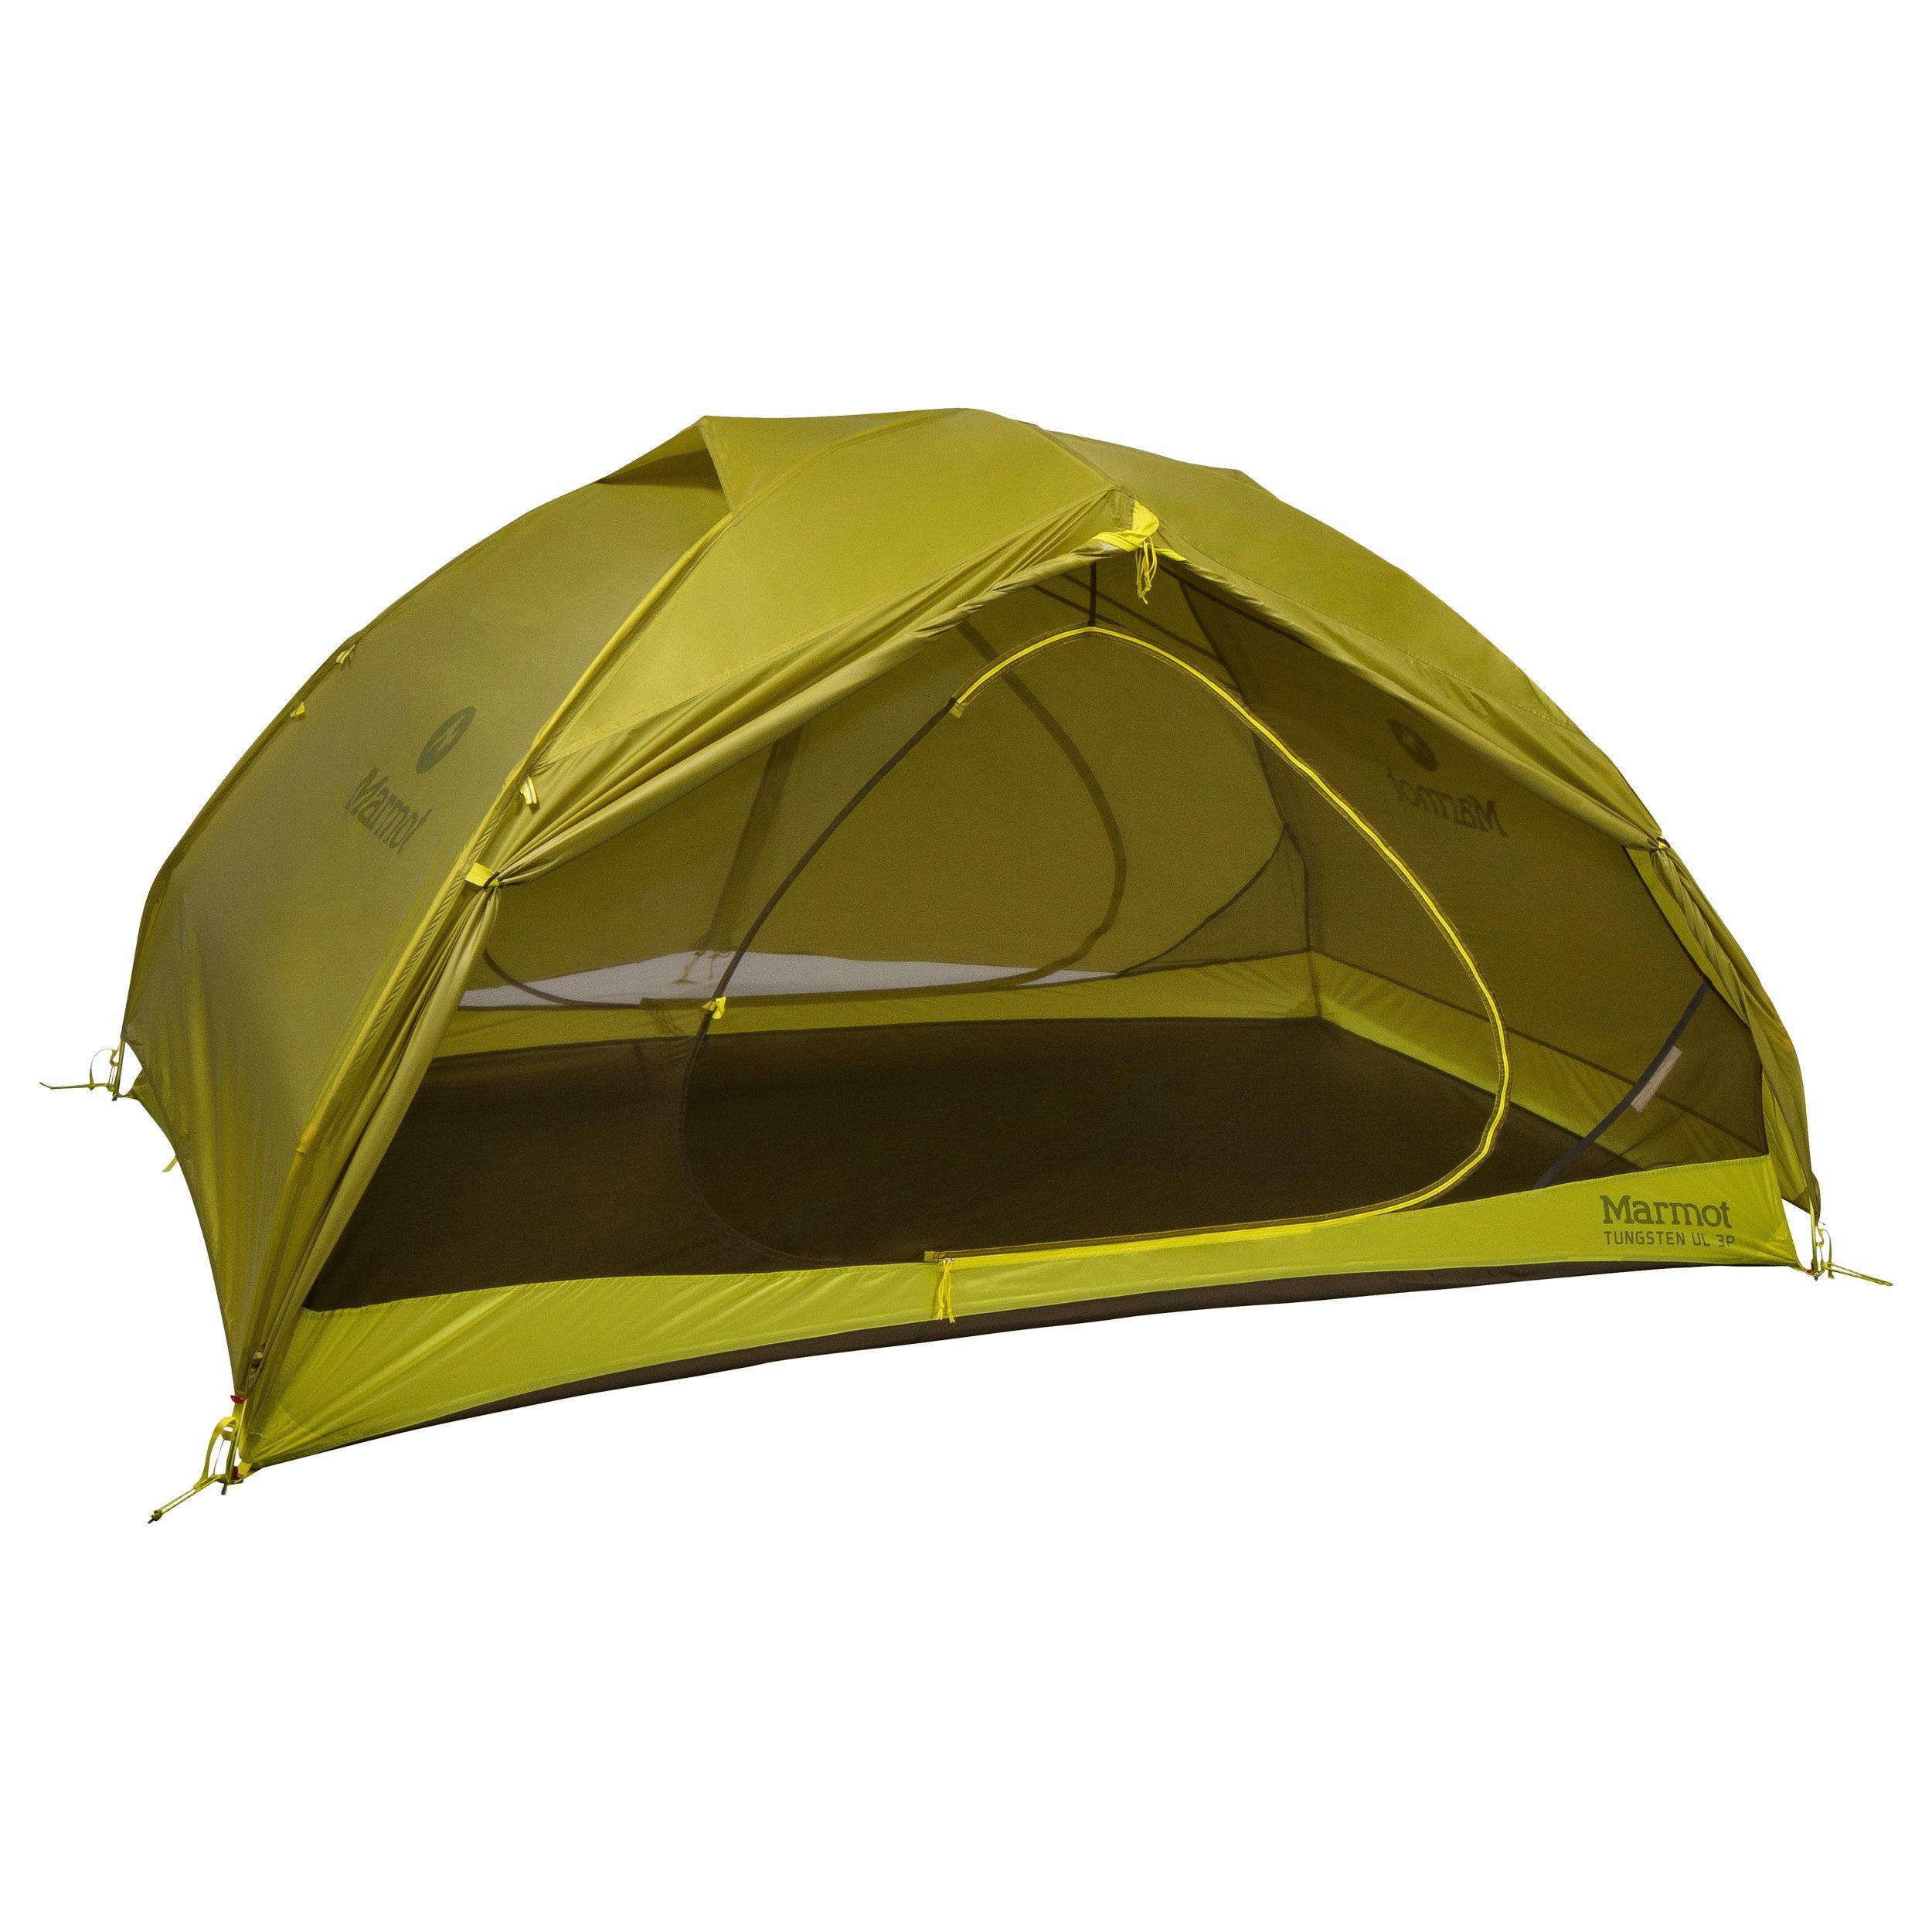 Marmot Tungsten 3 Man Tent  sc 1 st  Millet Sports & Marmot Tungsten 3 Man Tent | Millet Sports